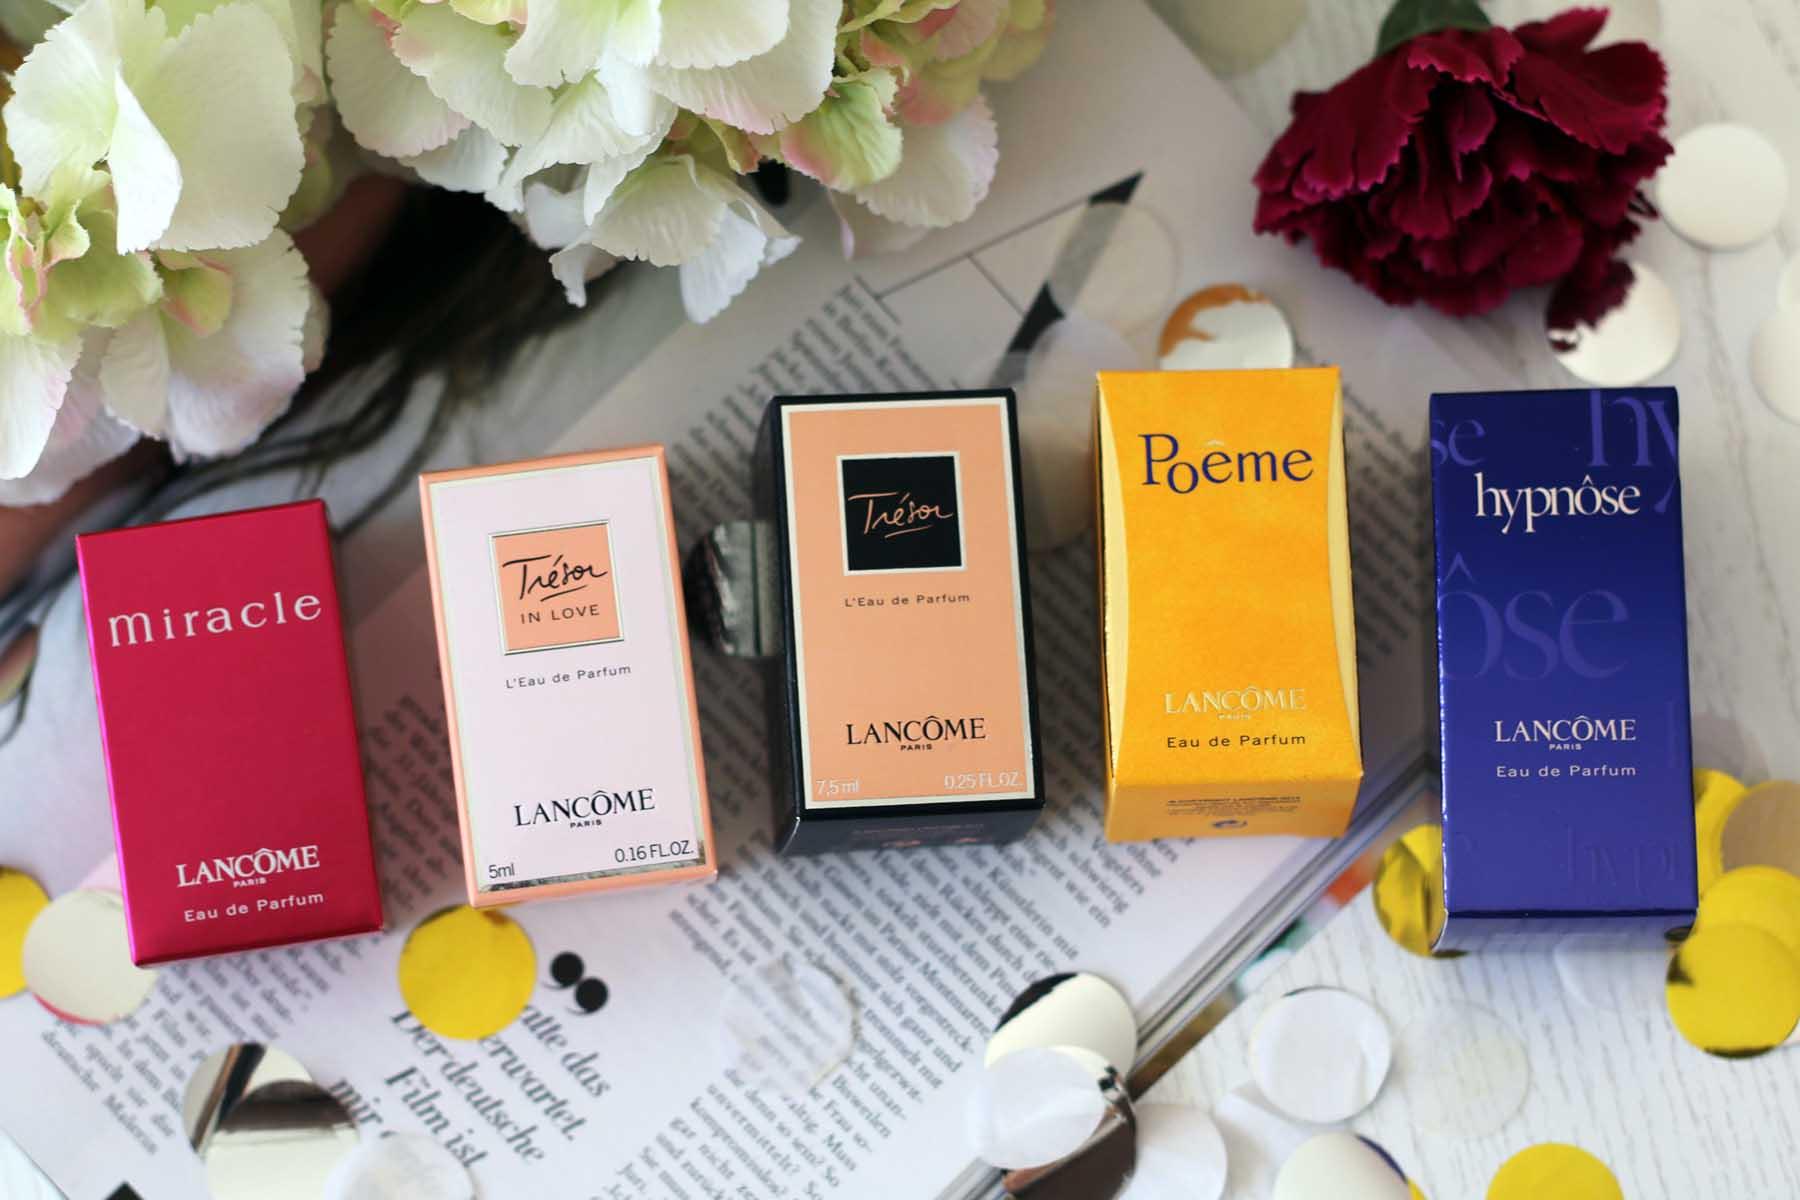 duty-free-shop-düsseldorf-worlddutyfree-yves-saint-laurent-parfüm-manifesto-beautyblog12